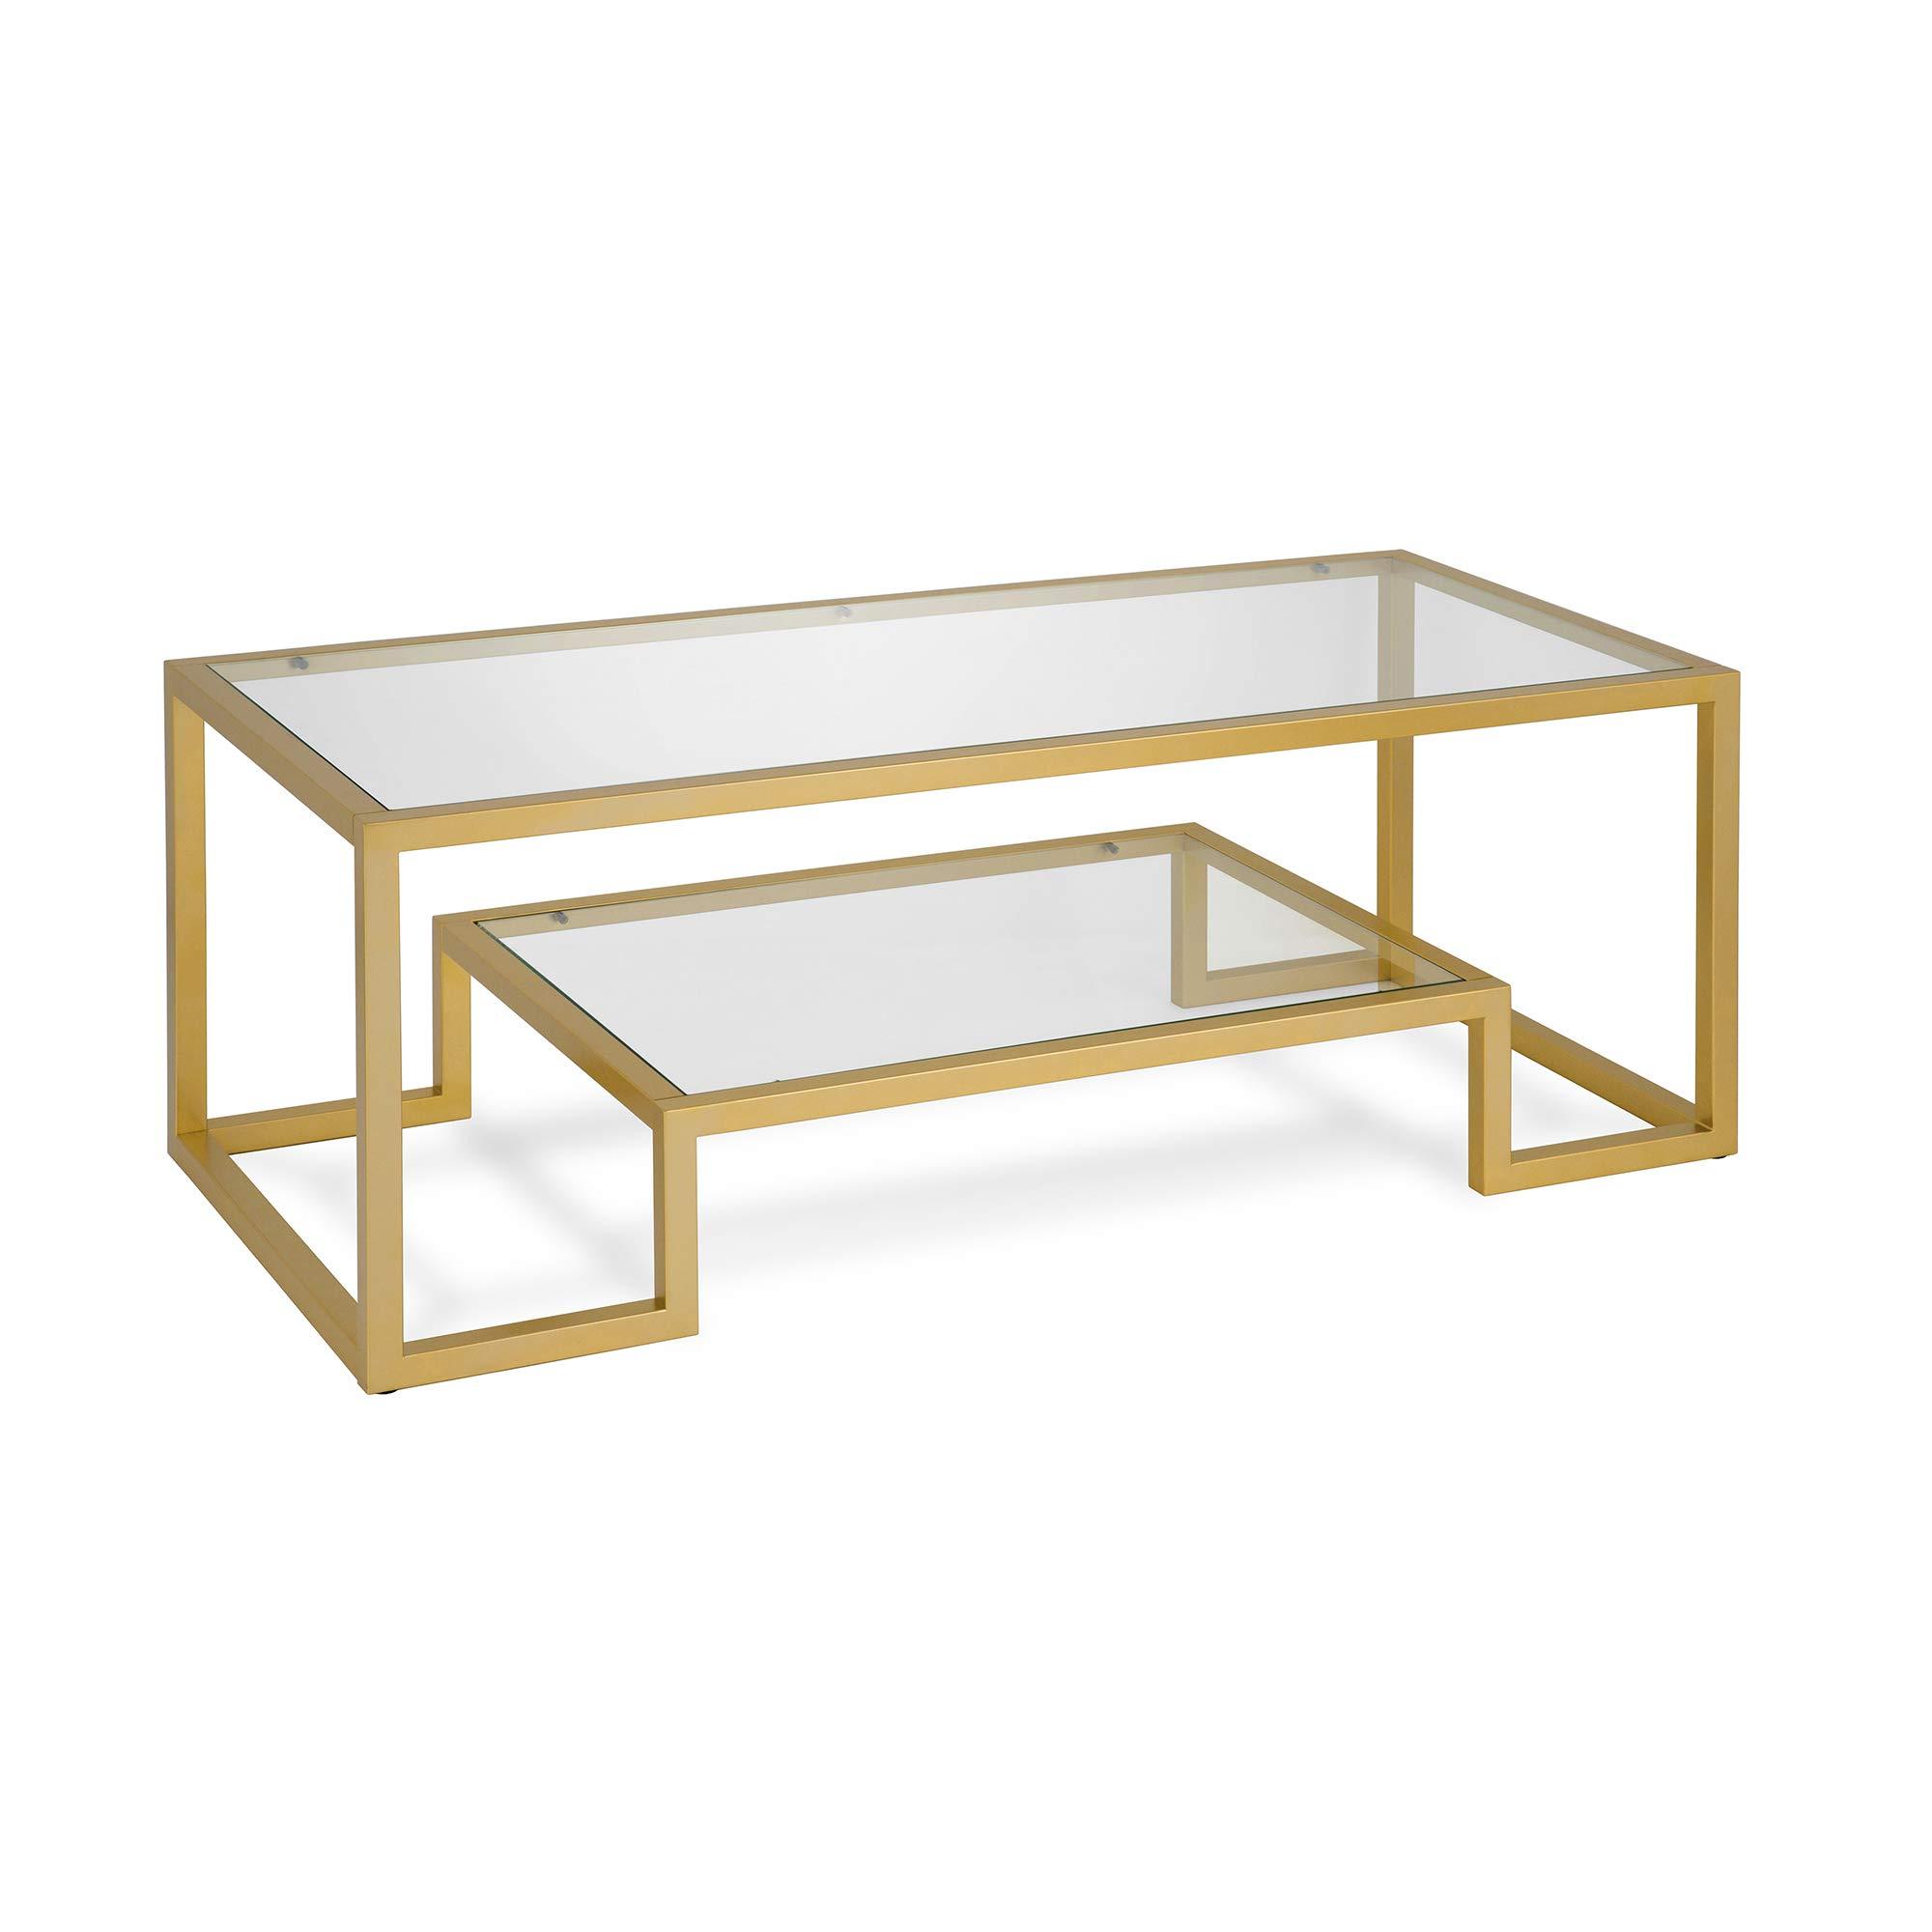 Henn&Hart Coffee Table, One Size, Gold by Henn&Hart